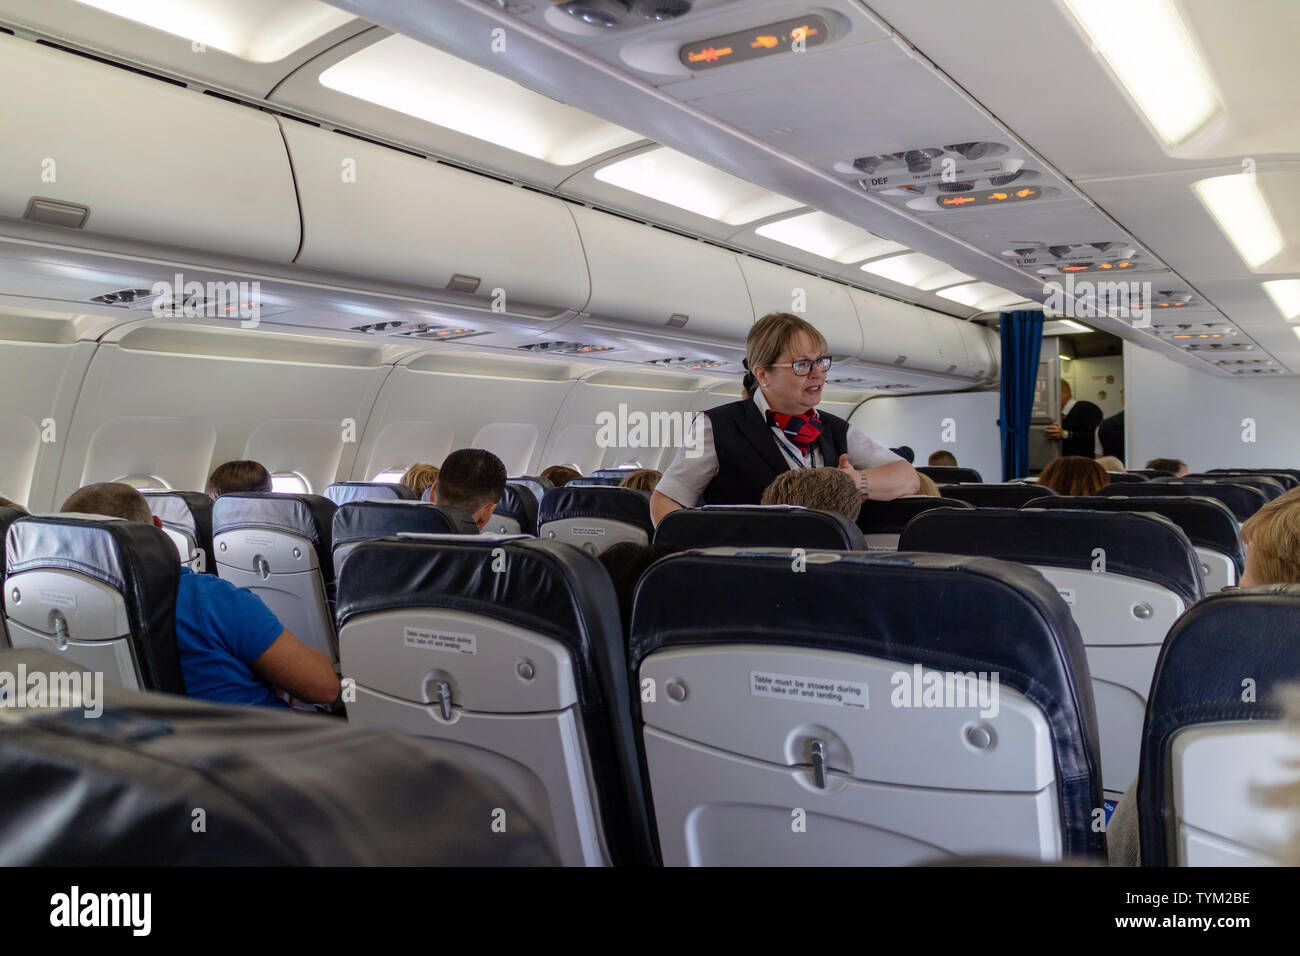 British Airways Cabin Crew Uniform Stock Photos & British